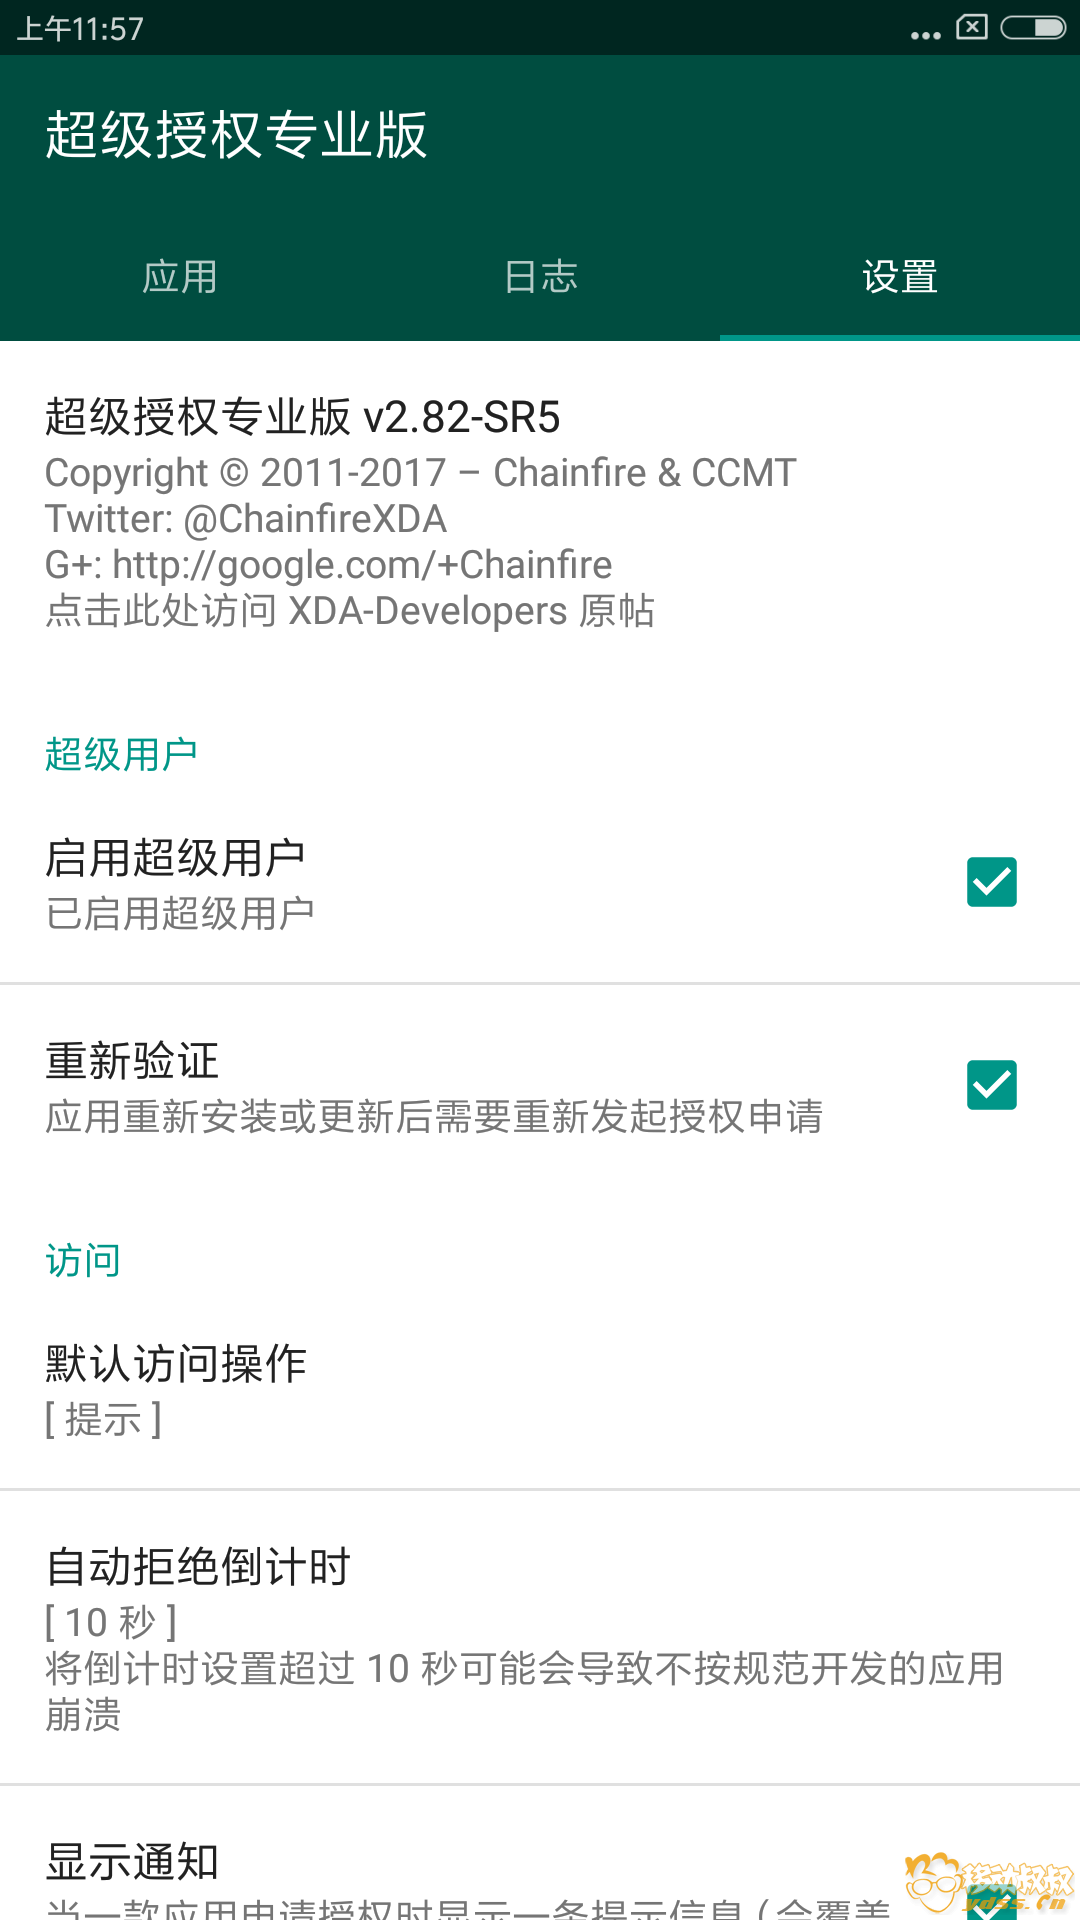 Screenshot_2018-06-17-11-57-54-866_eu.chainfire.supersu.png